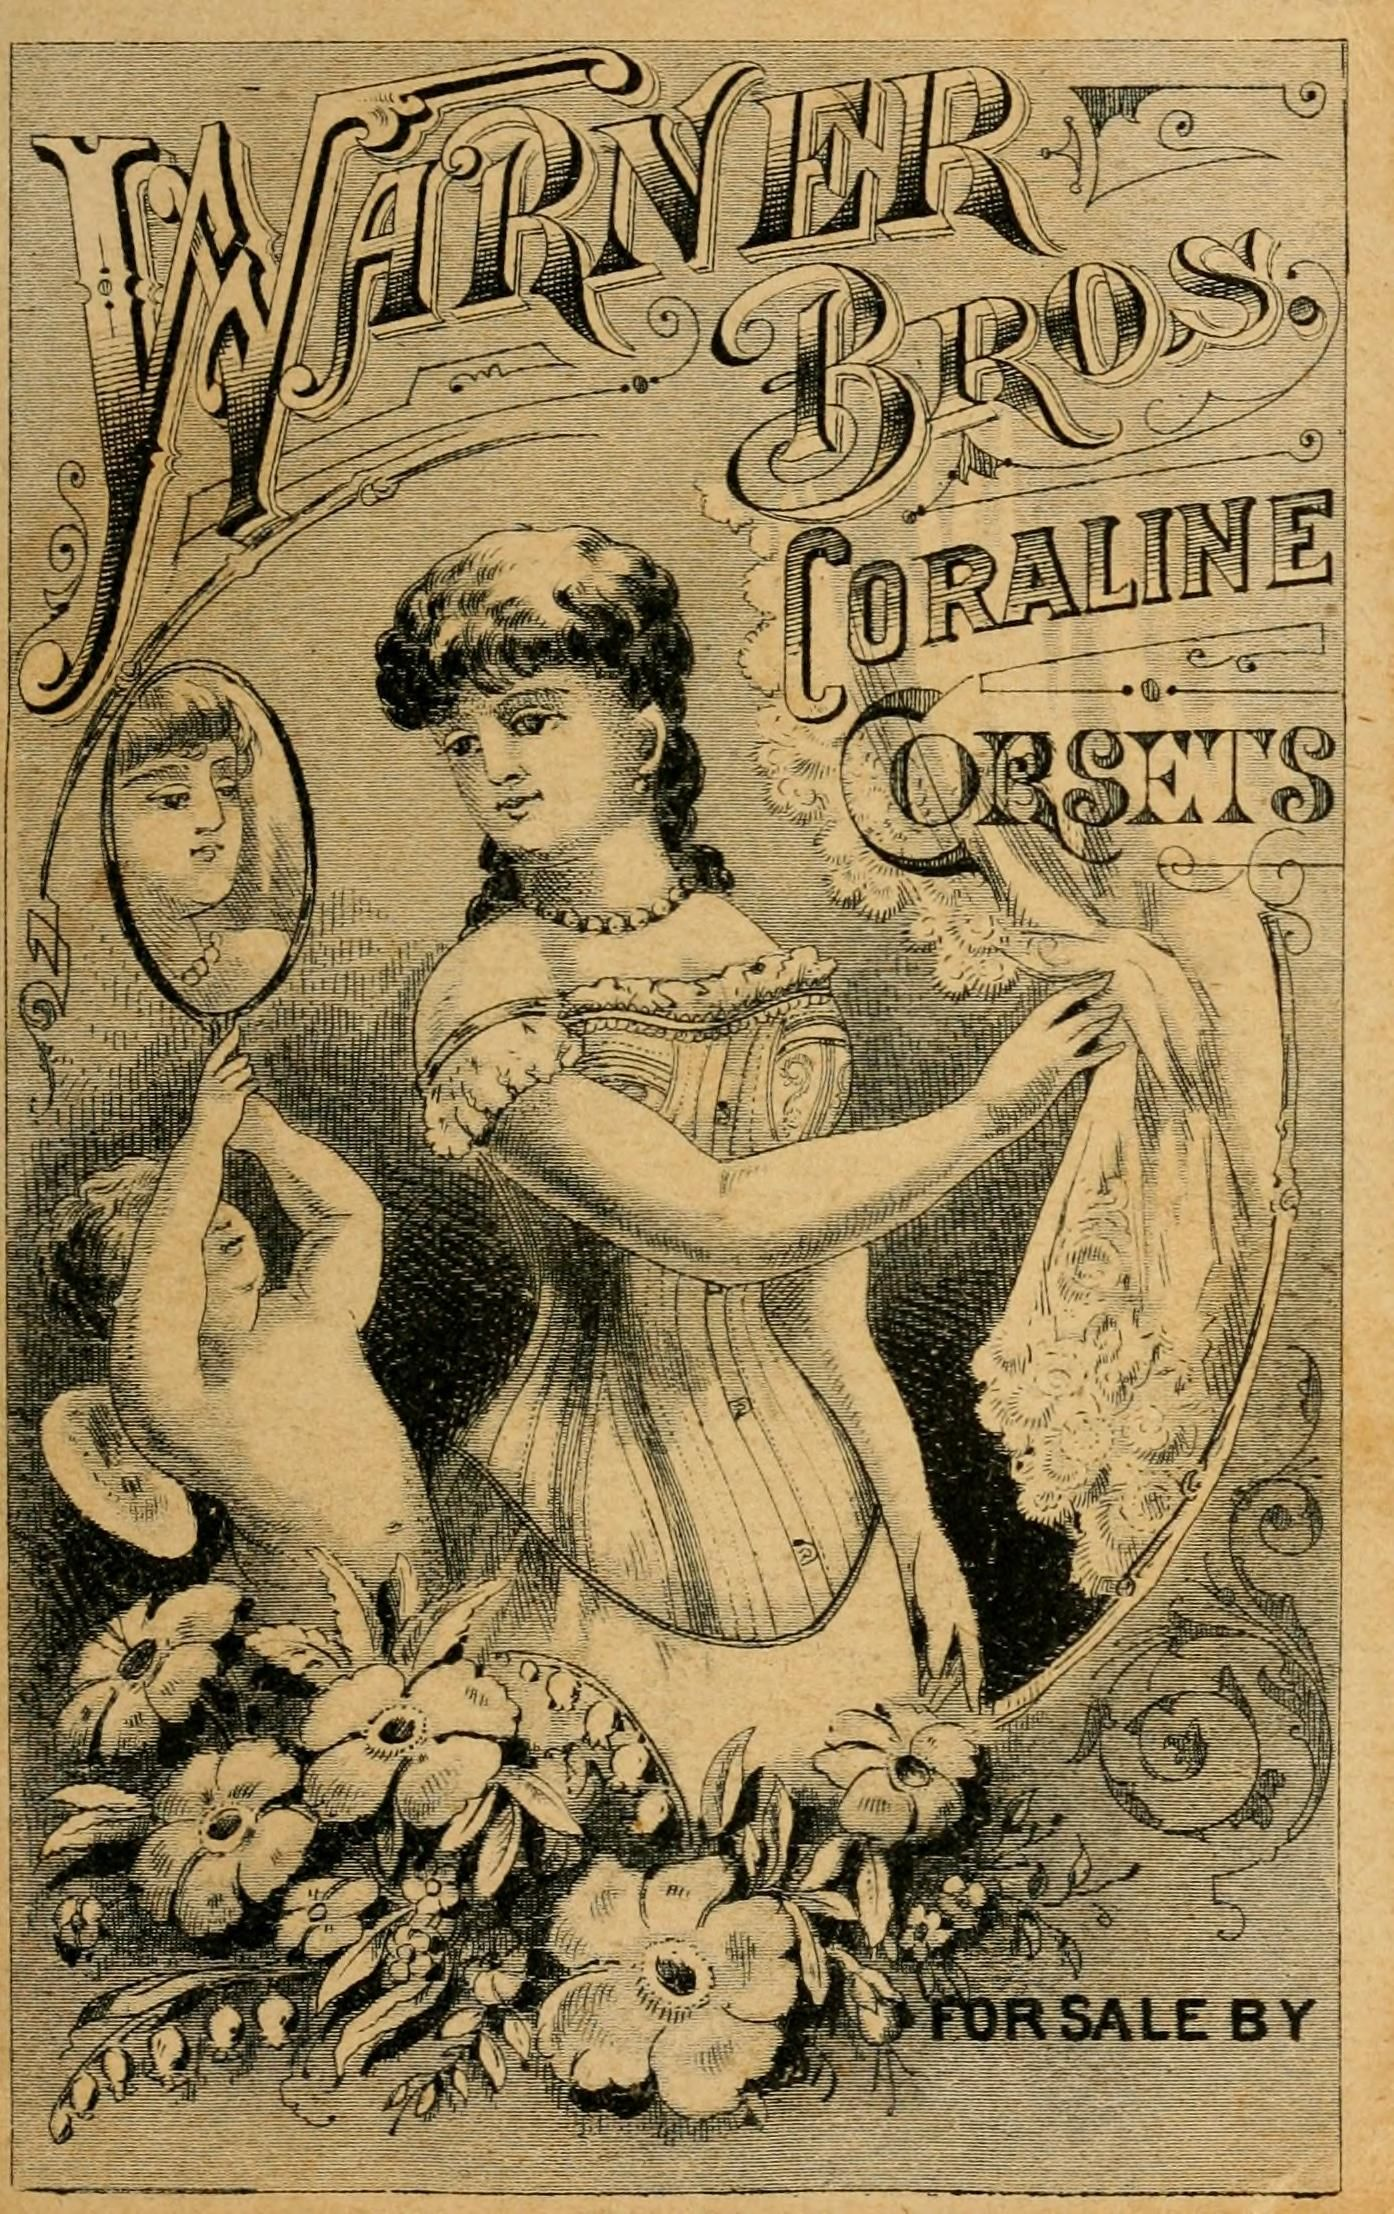 Warner Bros. coraline corsets.